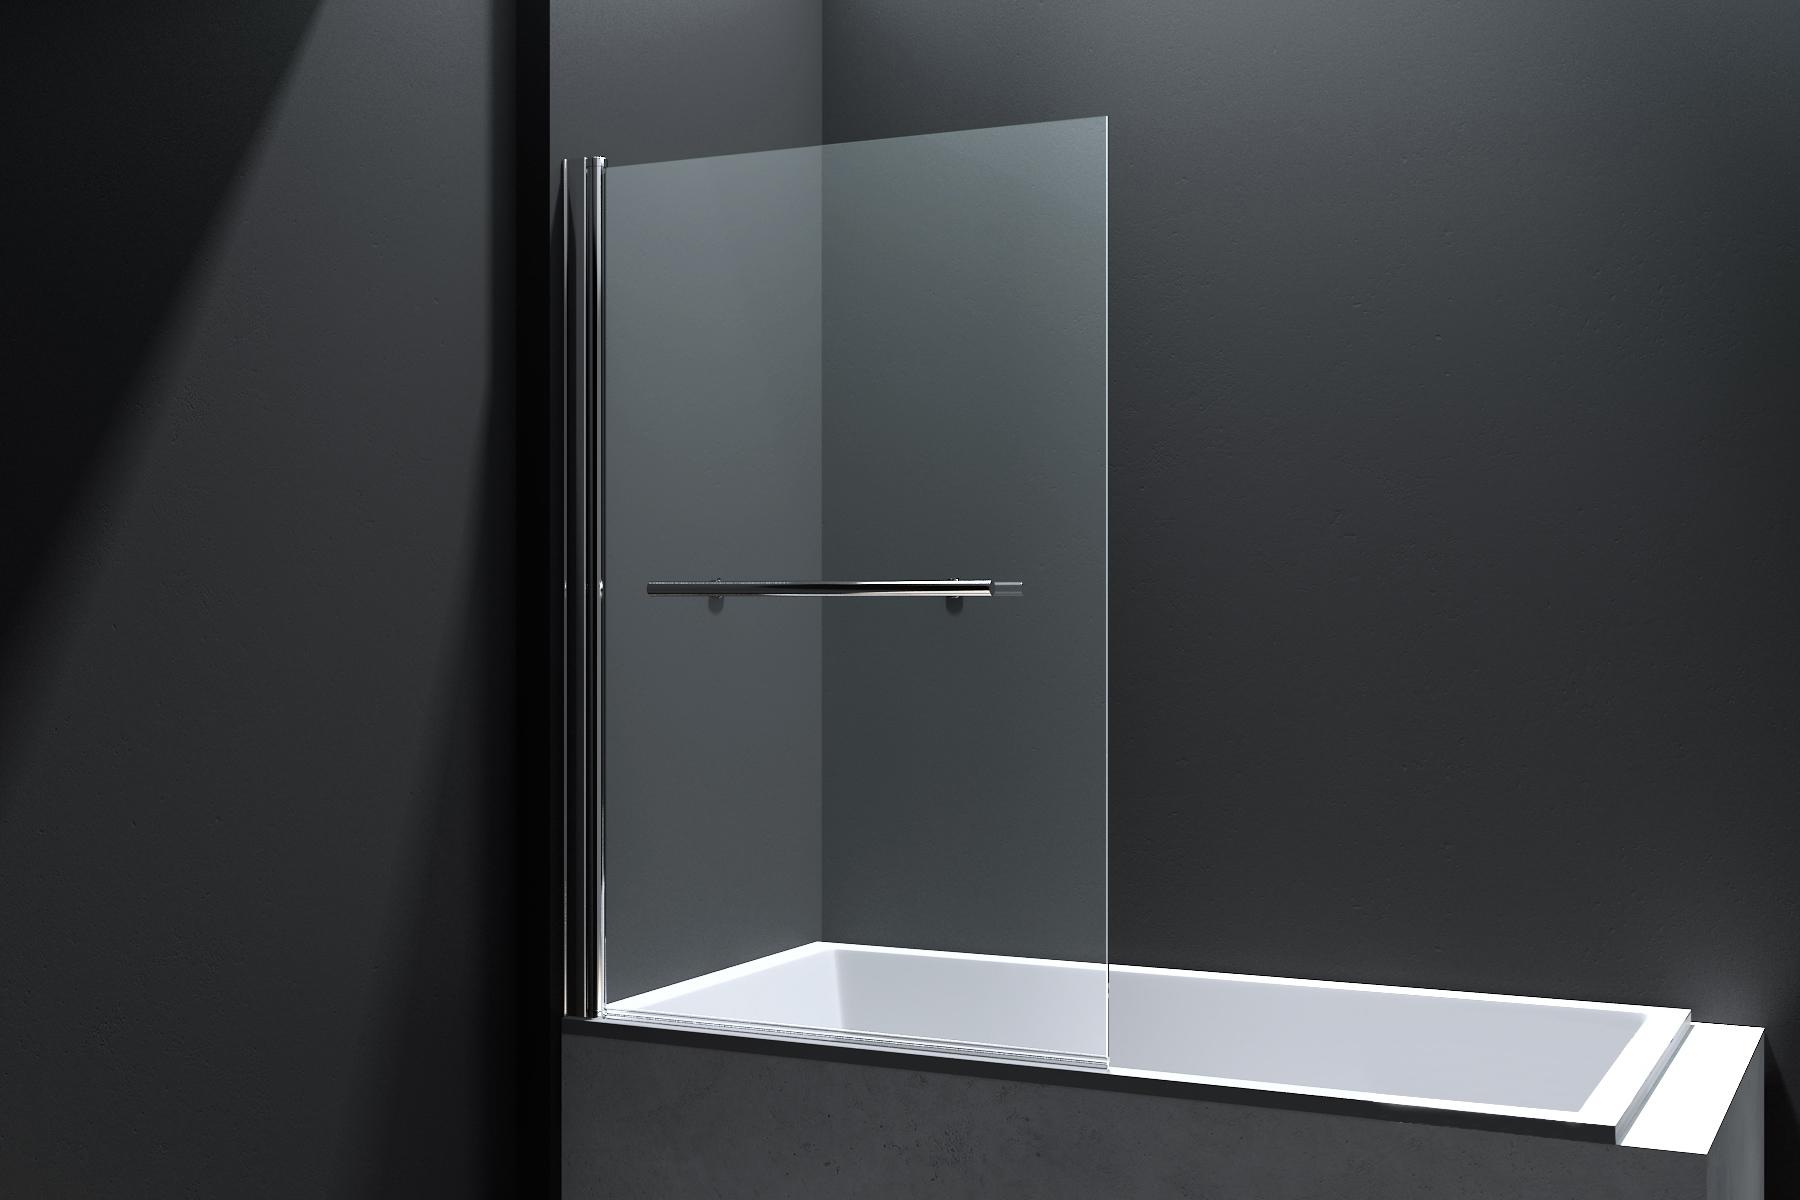 Best Design Erico badwand 80x140cm ANTI-KALK